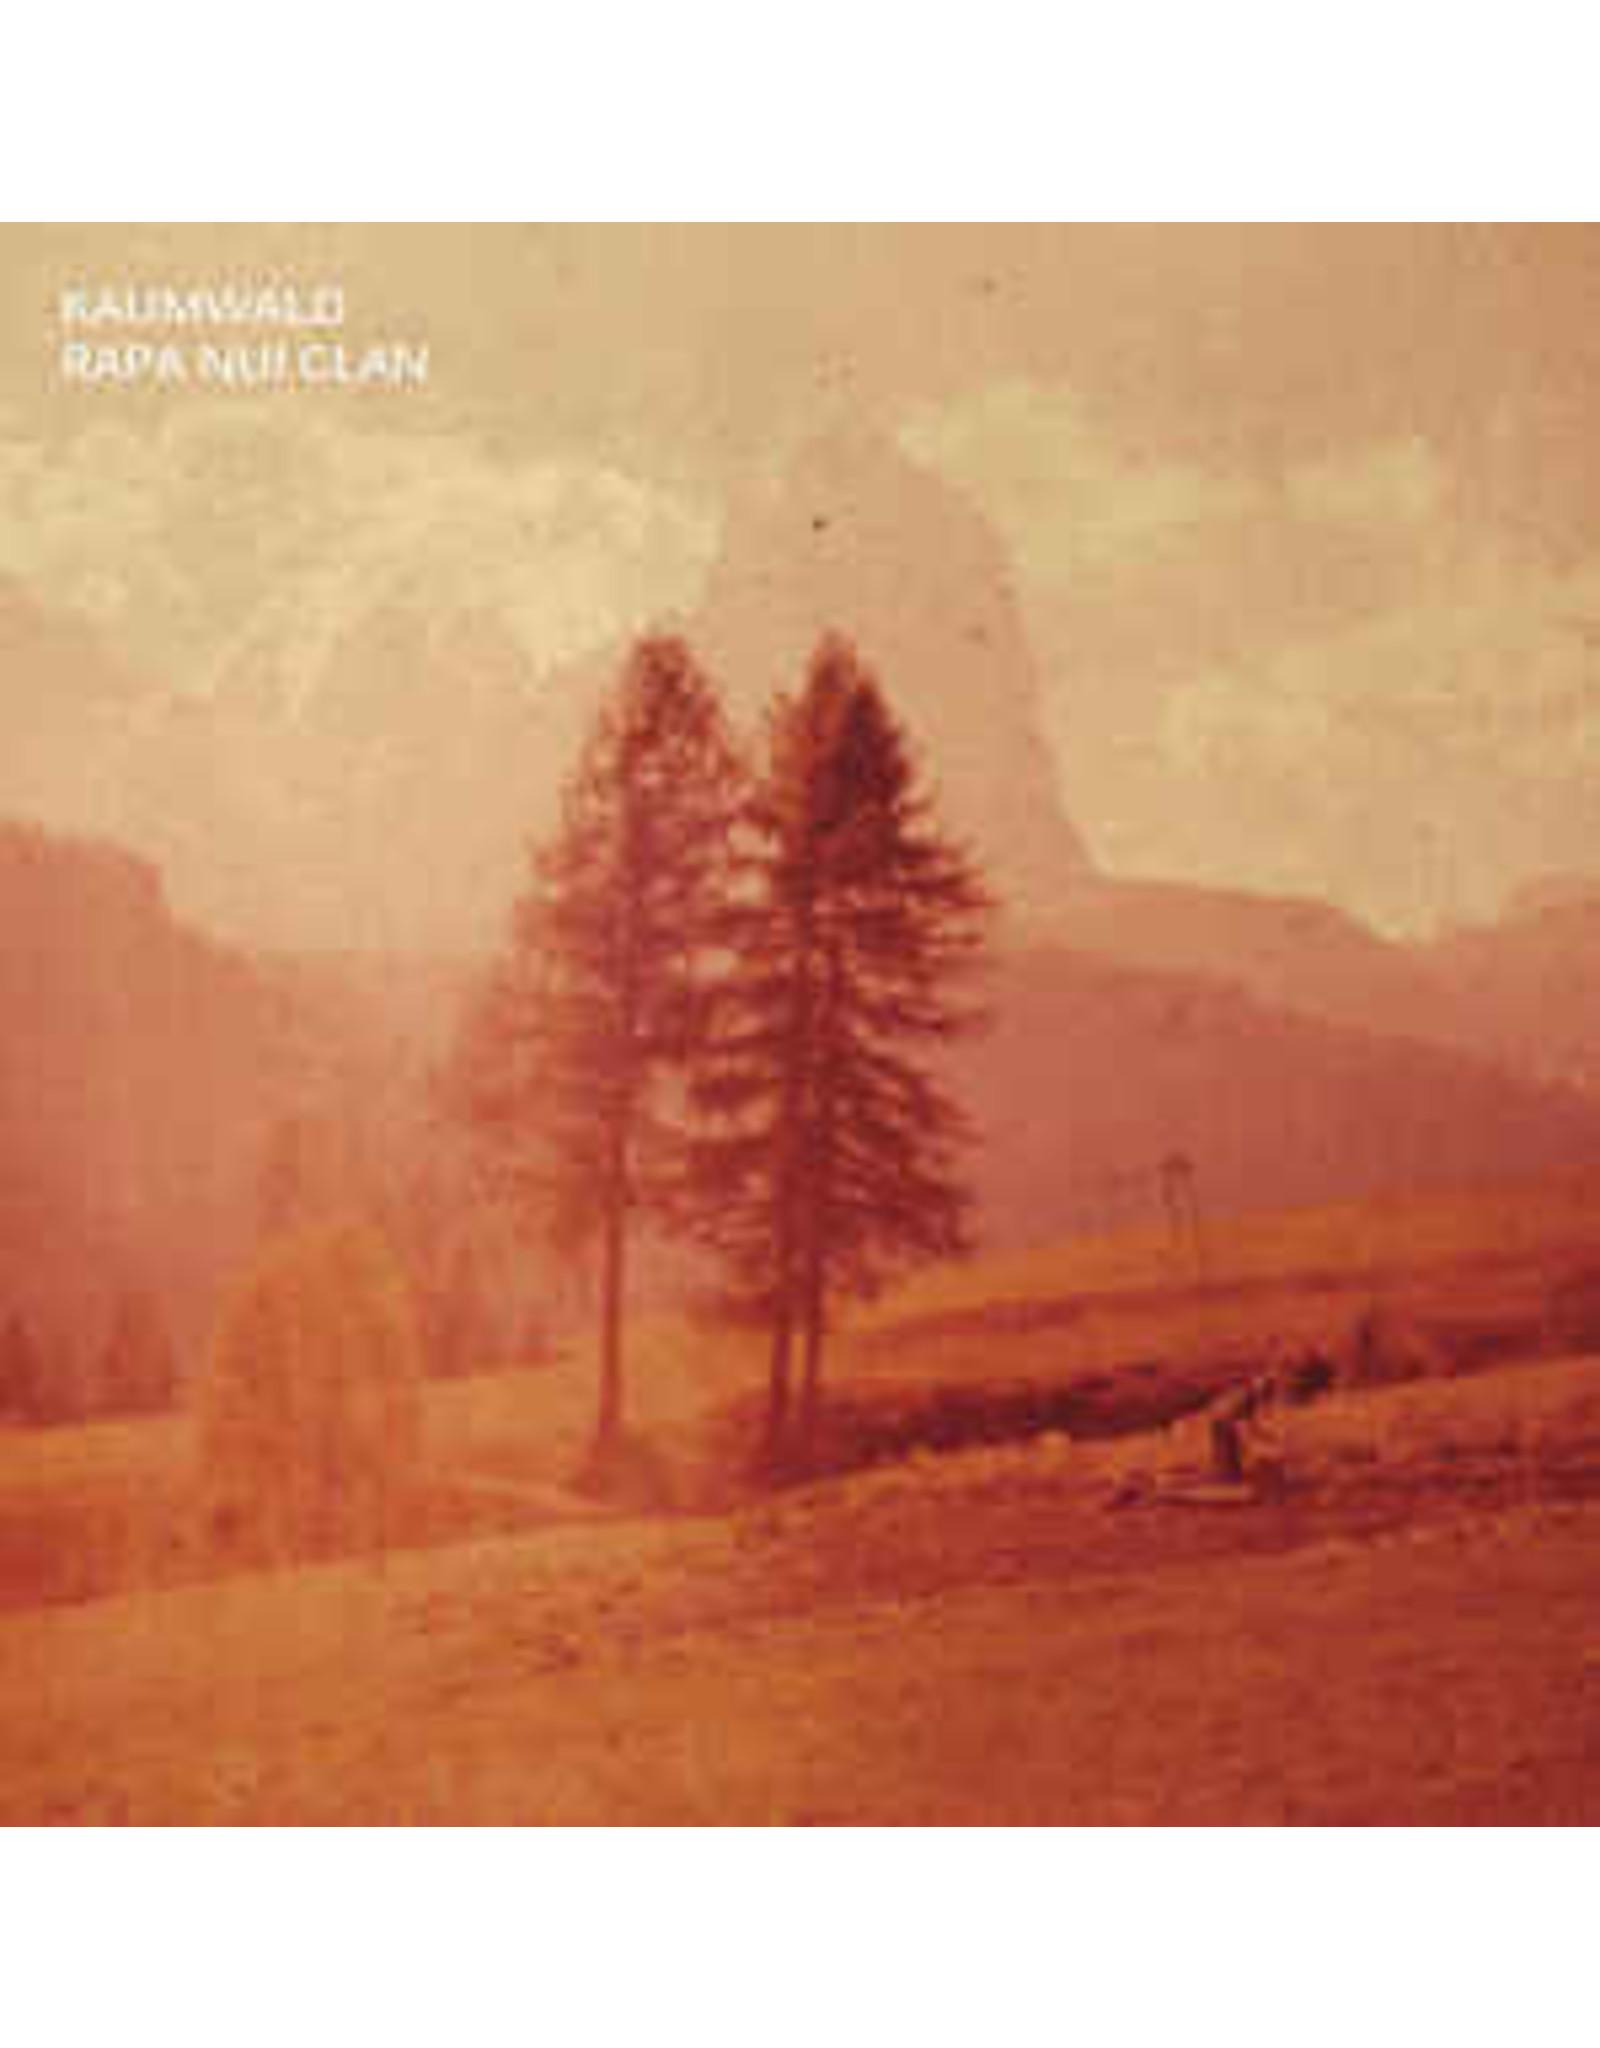 New Vinyl Kaumwald - Rapa Nui Clan LP